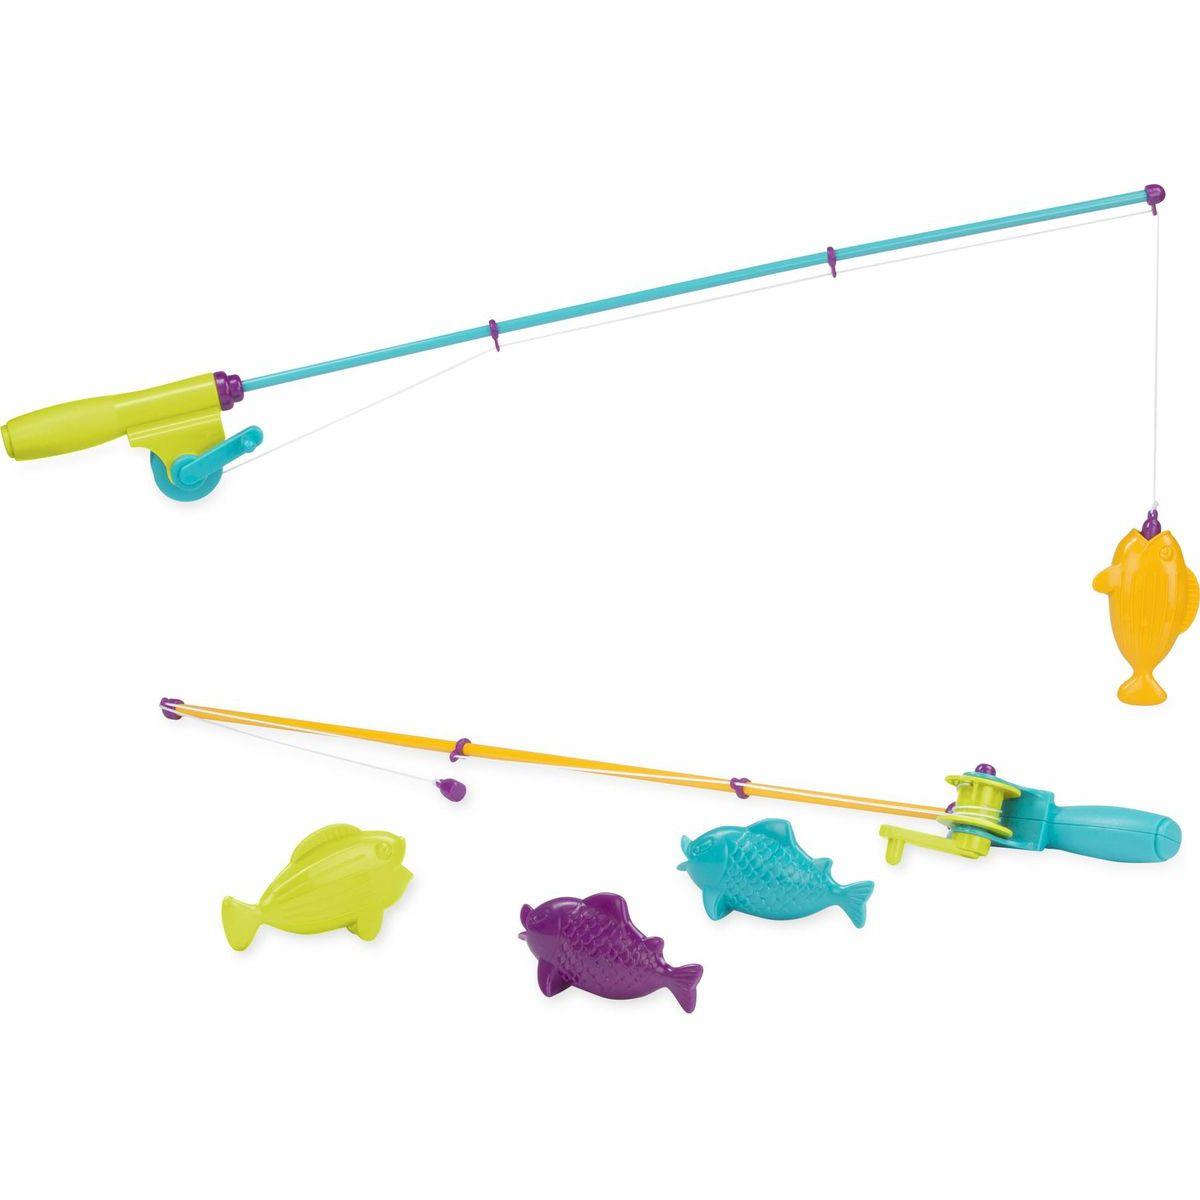 B.Toys Sada rybářských prutů s rybičkami